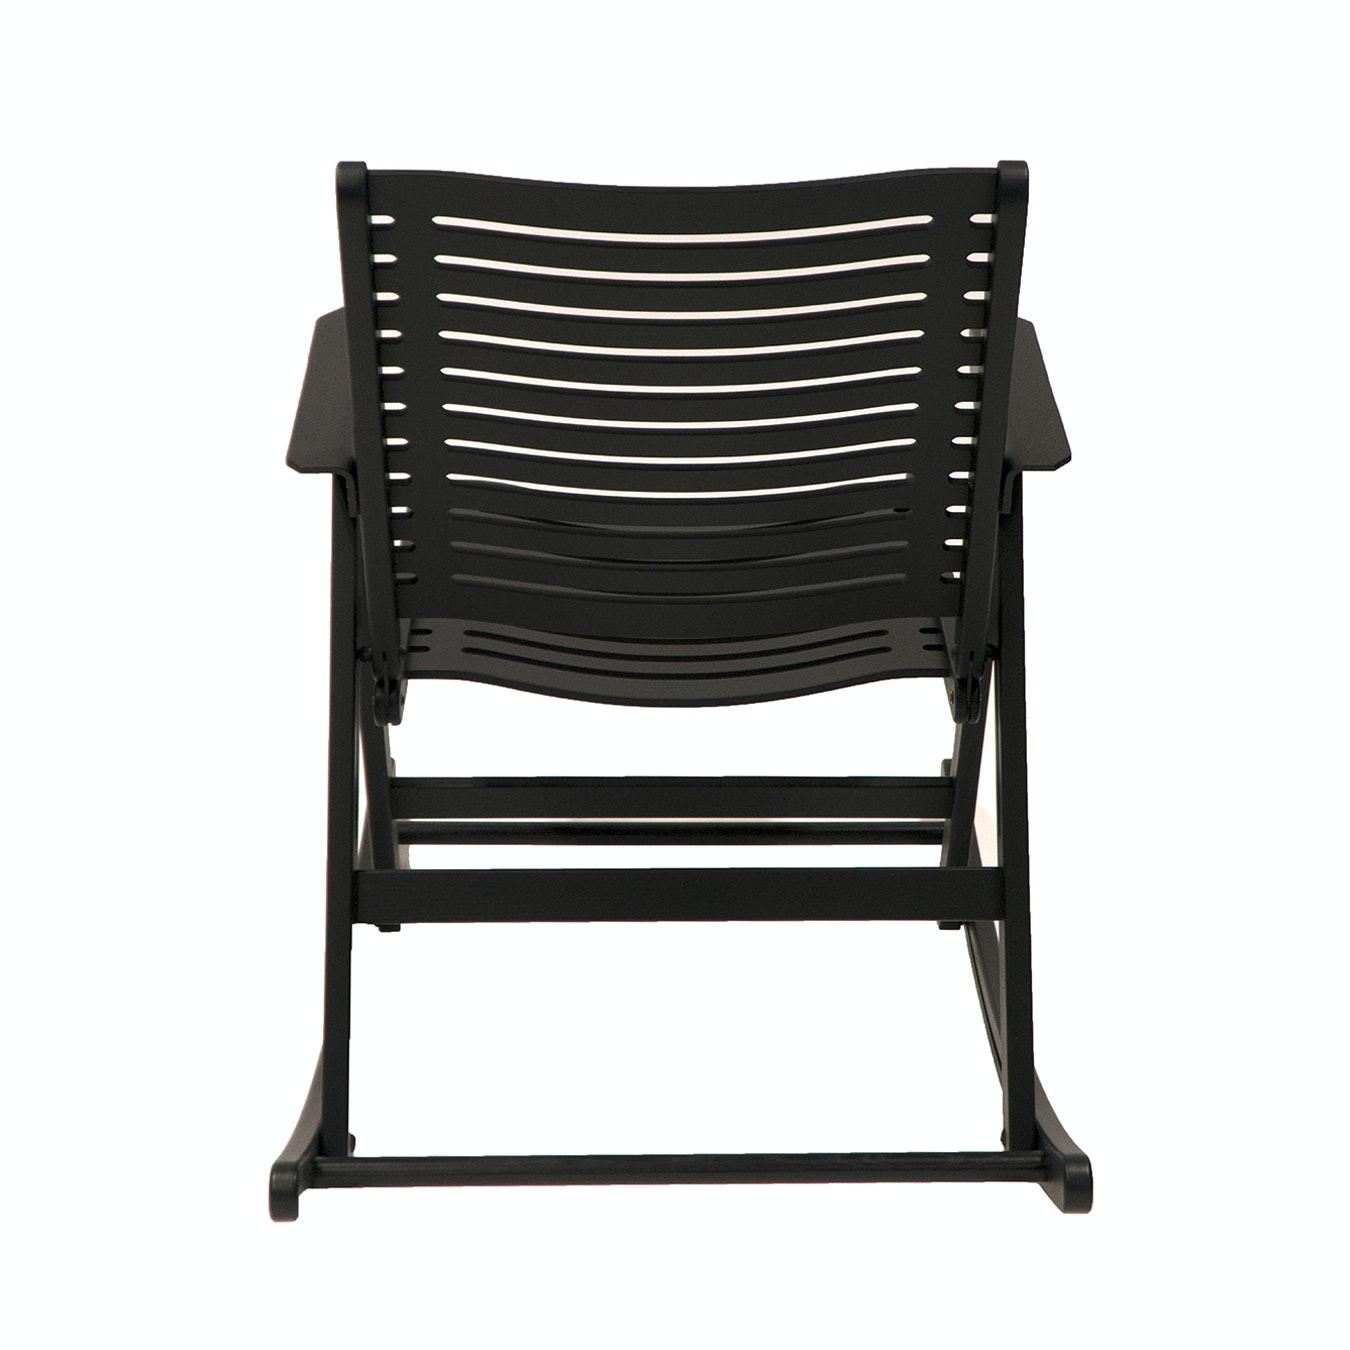 Swell Rex Rocking Chair Black Beechwood Andrewgaddart Wooden Chair Designs For Living Room Andrewgaddartcom